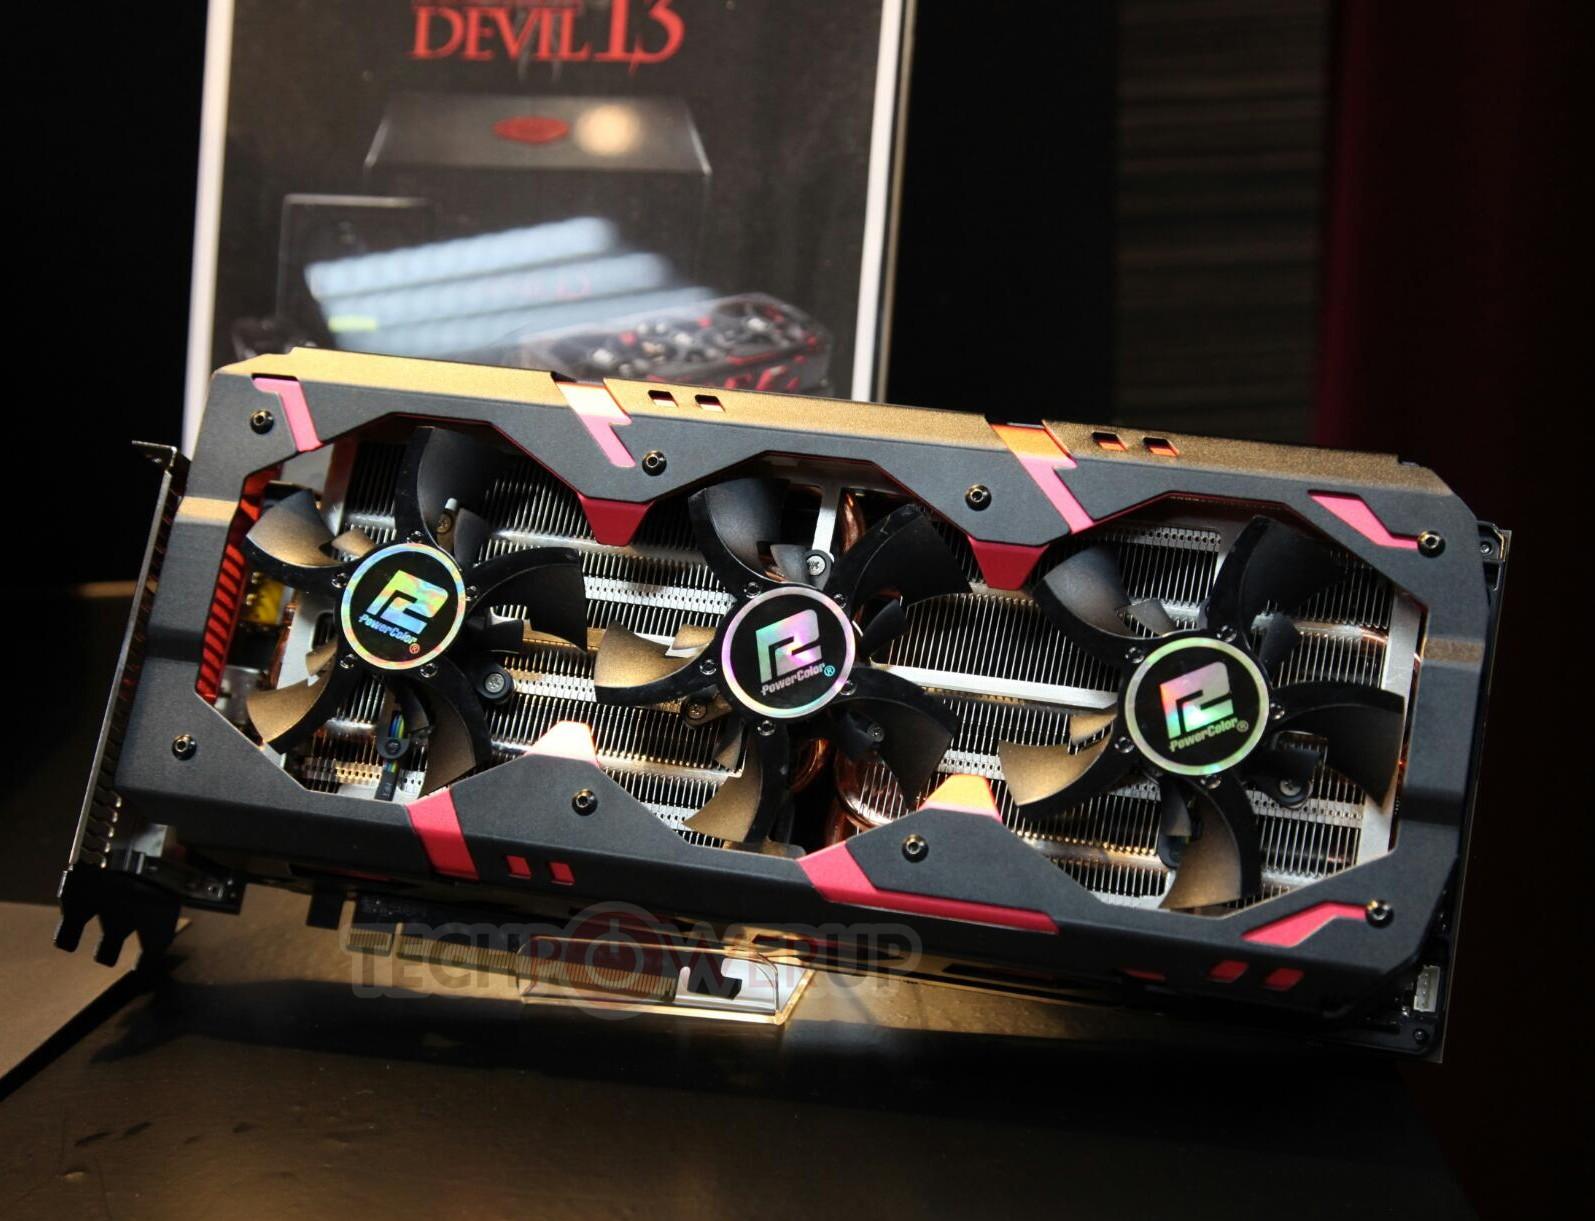 Techpowerup com] PowerColor Radeon R9 295X2 Devil13 Up Close